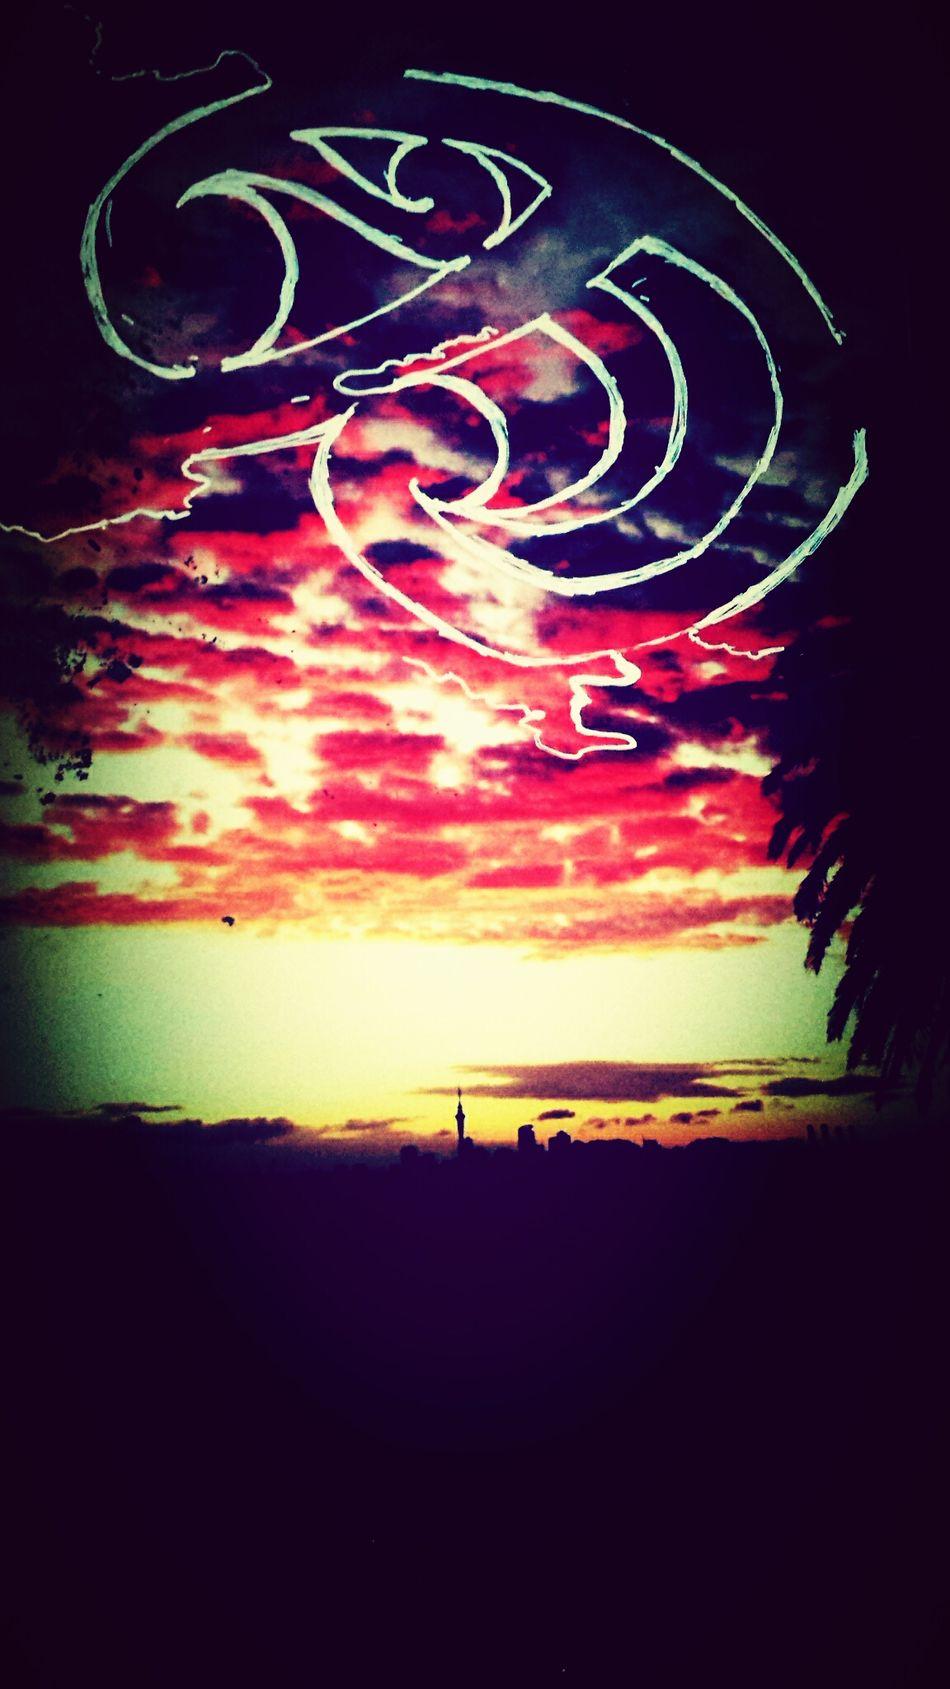 Cityscapes Sky On Fire Sunset Silhouettes Maori Art